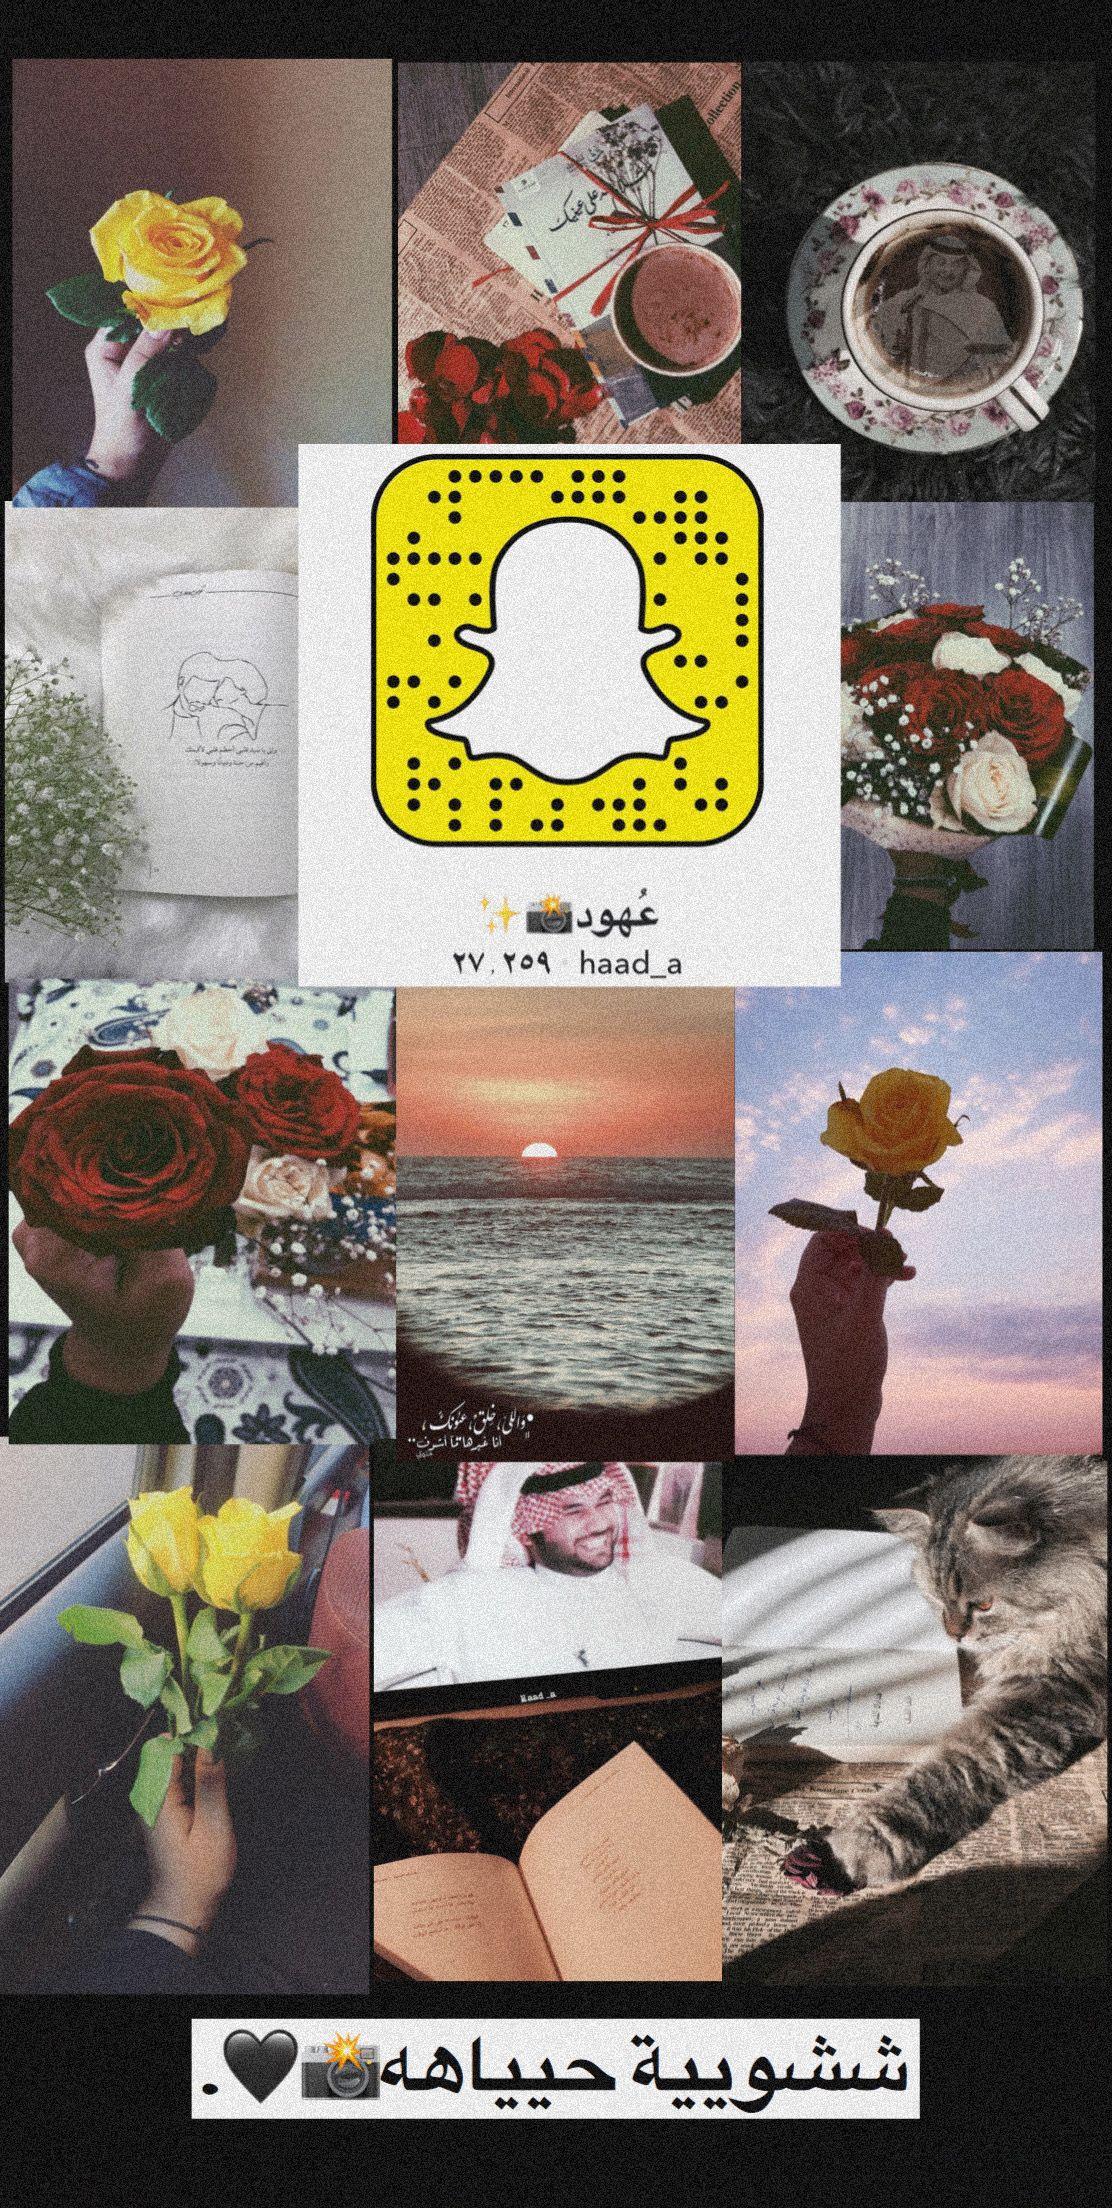 سنابات سناب تصويري تصوير لقطات ورد Snapchat Projects To Try Projects Snapchat